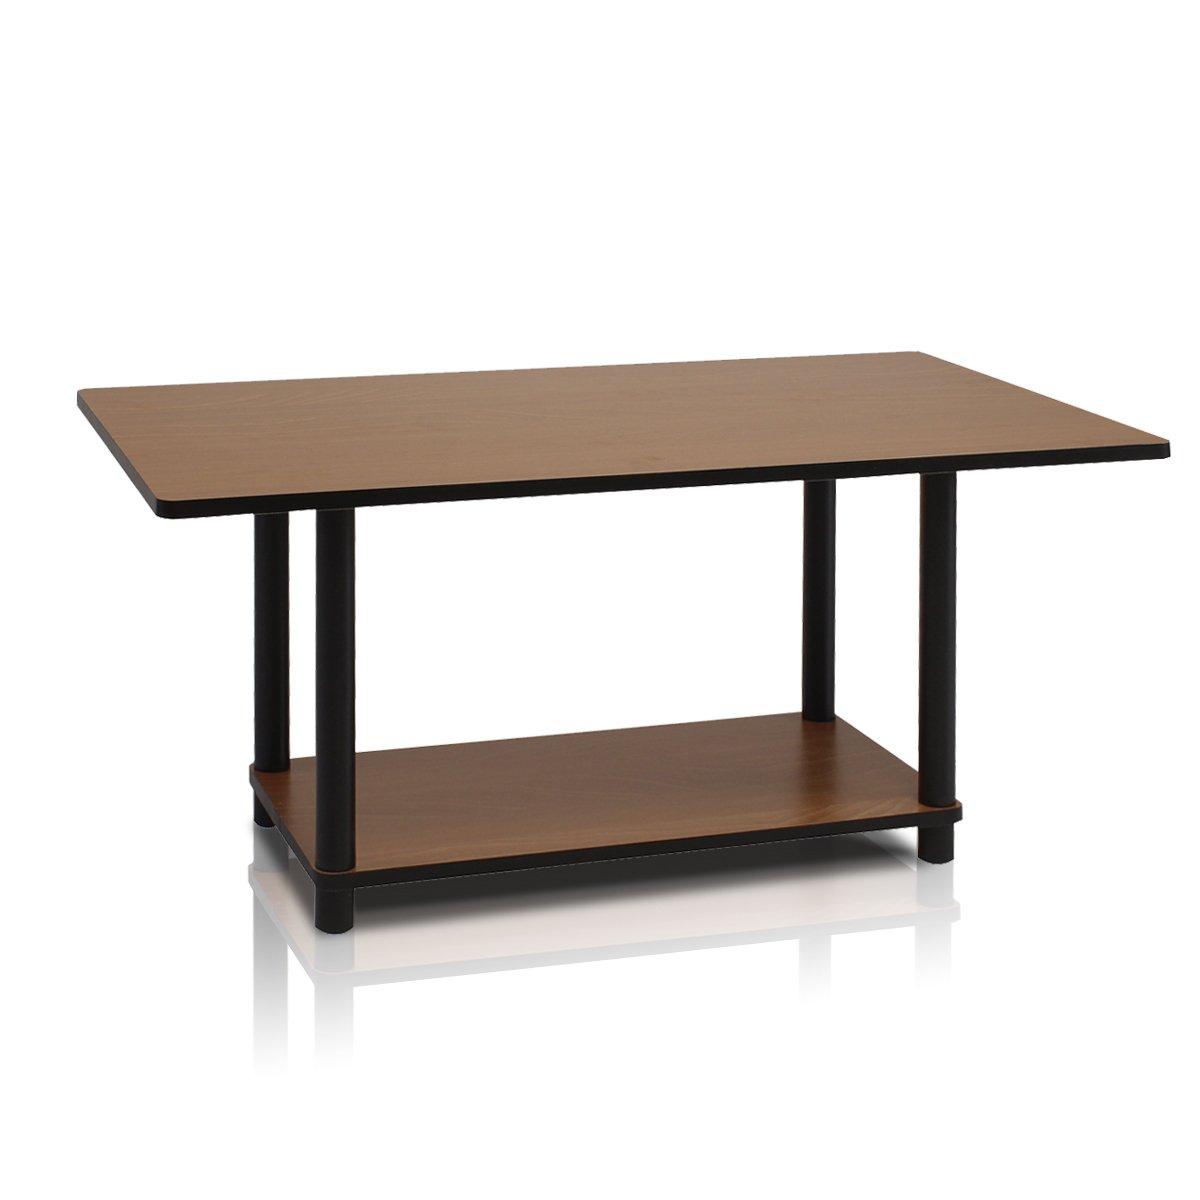 Furinno 99192DC/BK Turn-N-Tube Coffee Table, Dark Cherry/Black